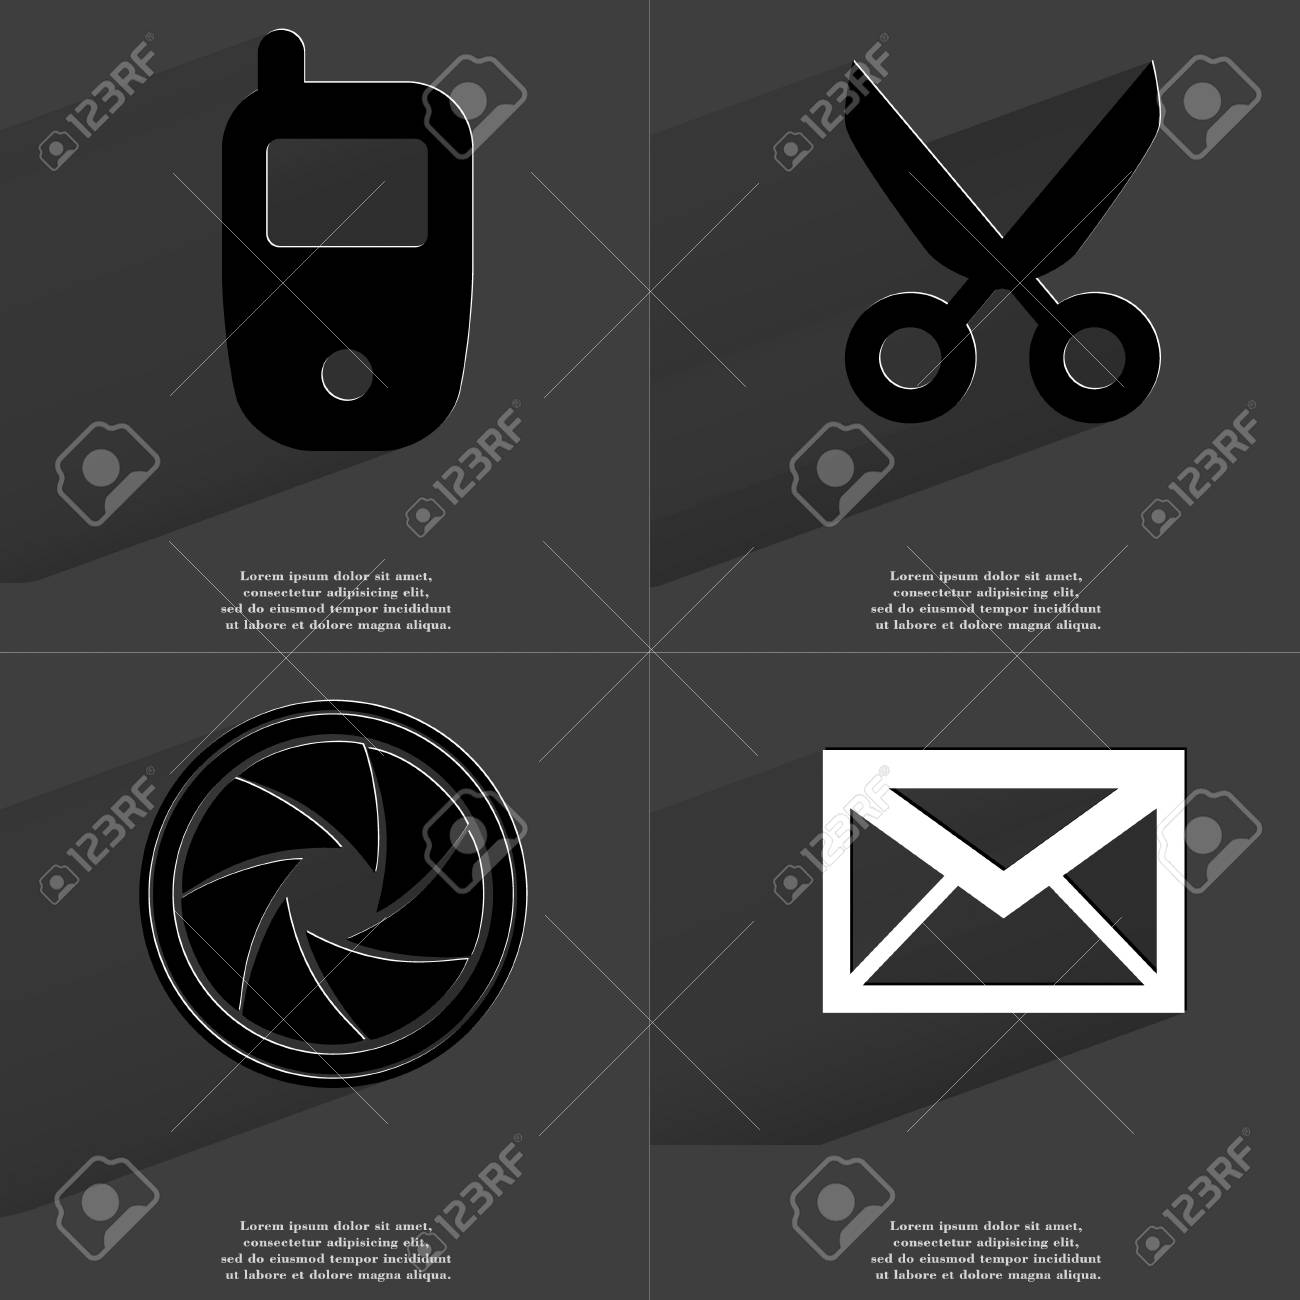 Mobile Phone Scissors Lens Message Icon Sign Set Of Symbols